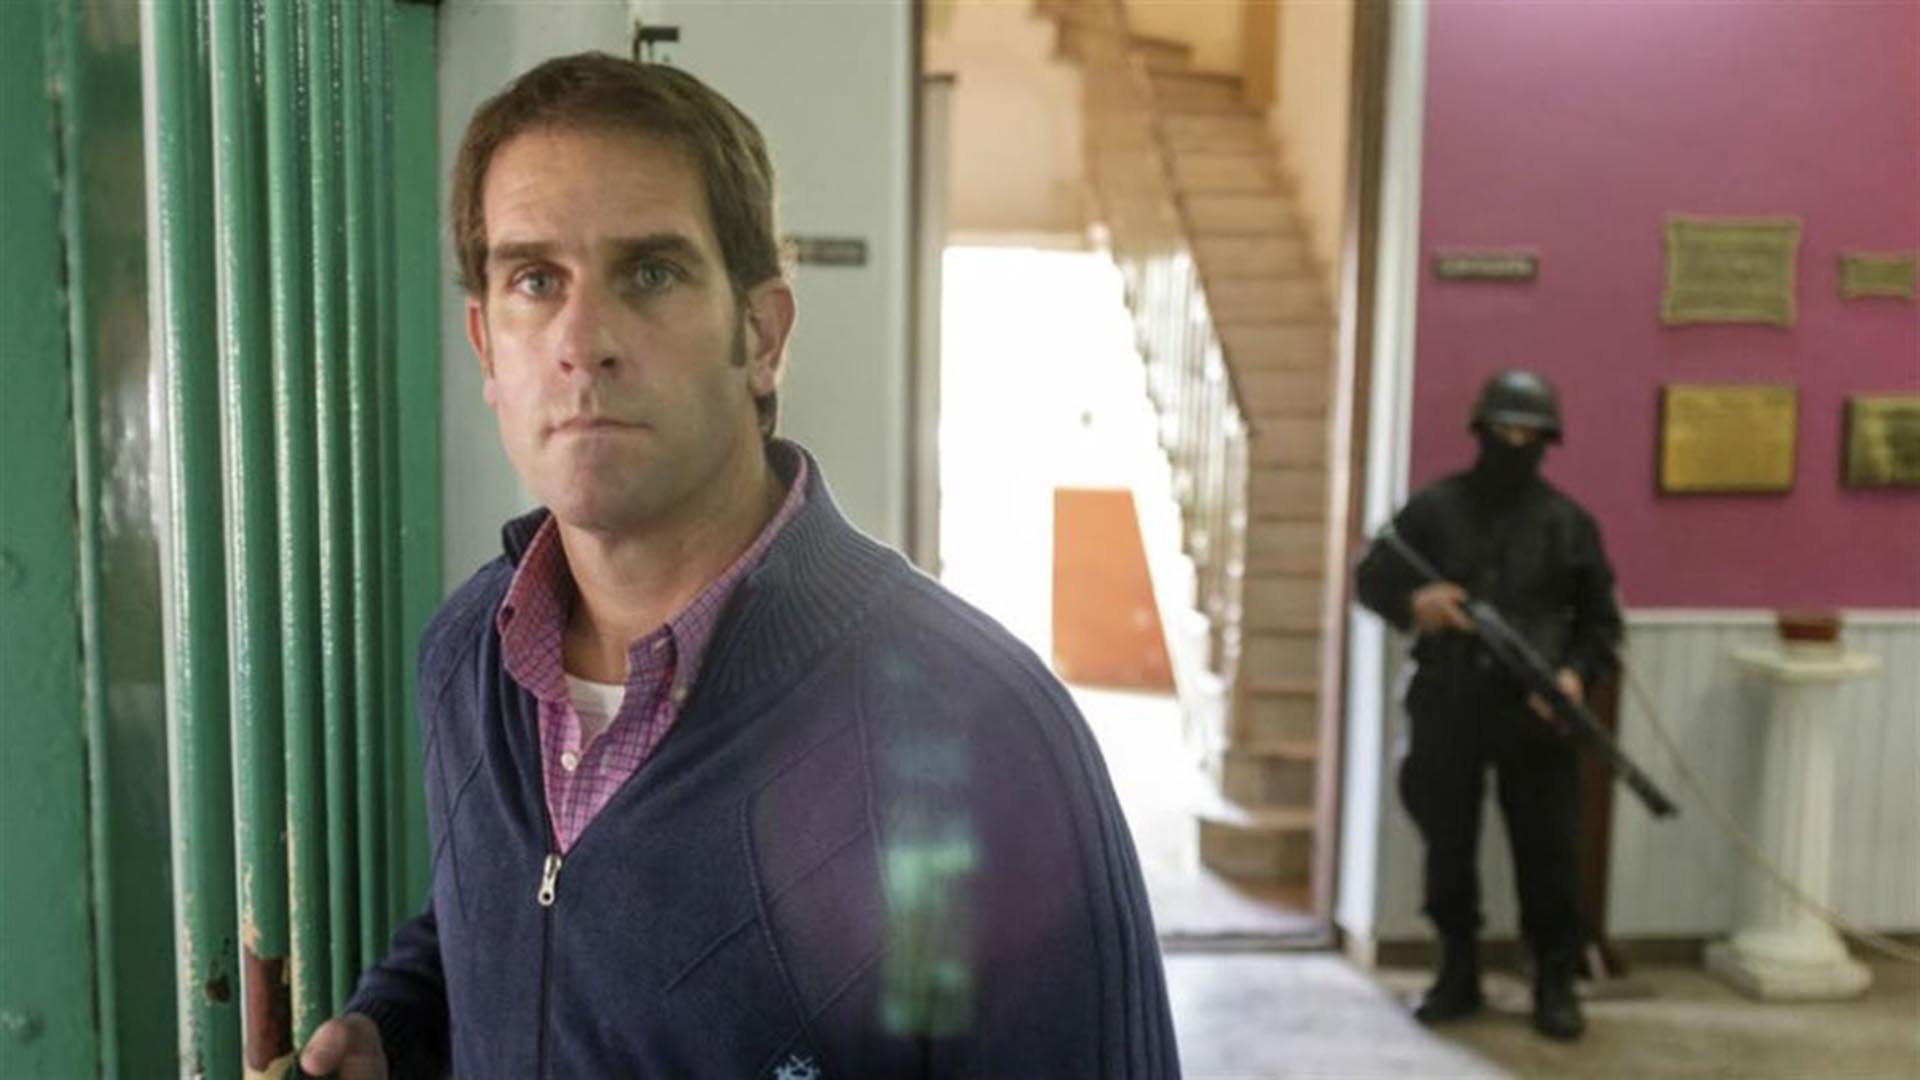 Alan Schlenker fue condenado a cadena perpetua como instigador del crimen de Gonzalo Acro (@schlenkeralan)